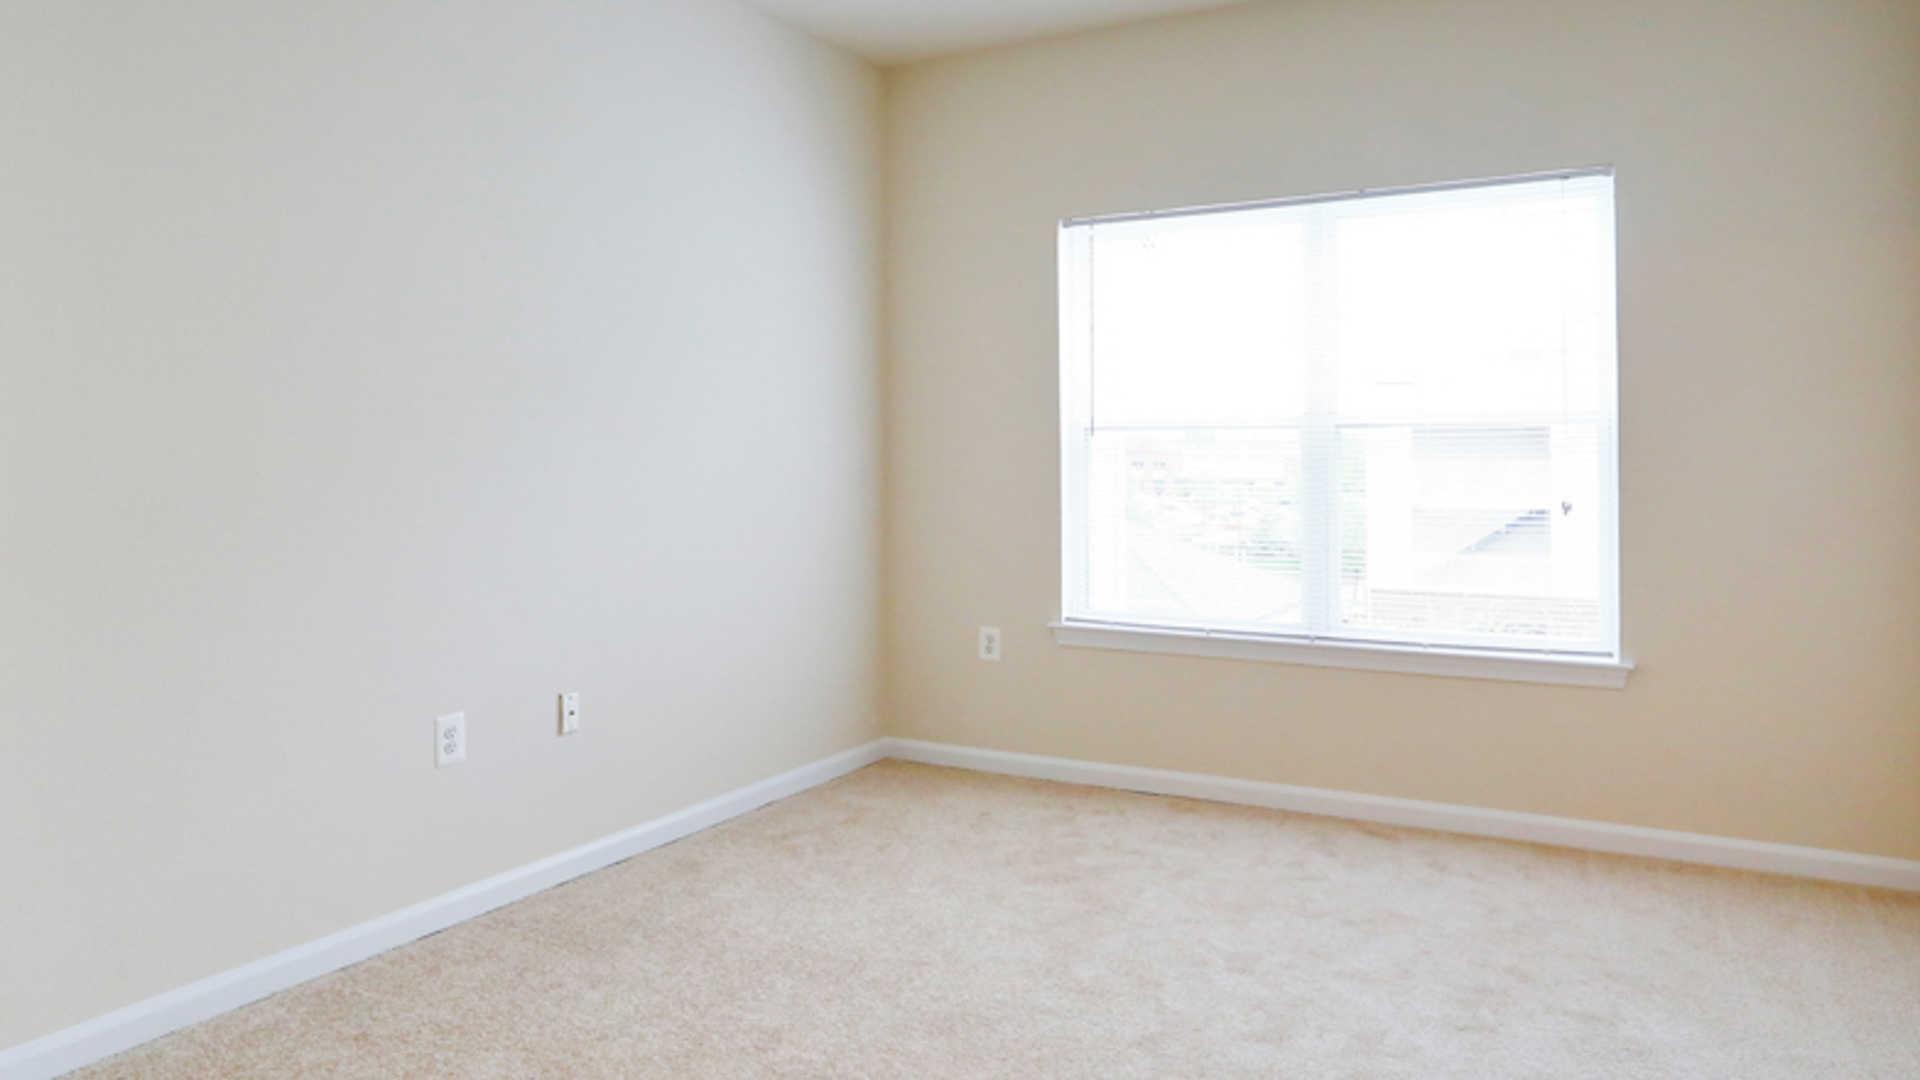 Reserve At Potomac Yard Apartments Reviews In Alexandria   3700 Jefferson  Davis Hwy   EquityApartments.com